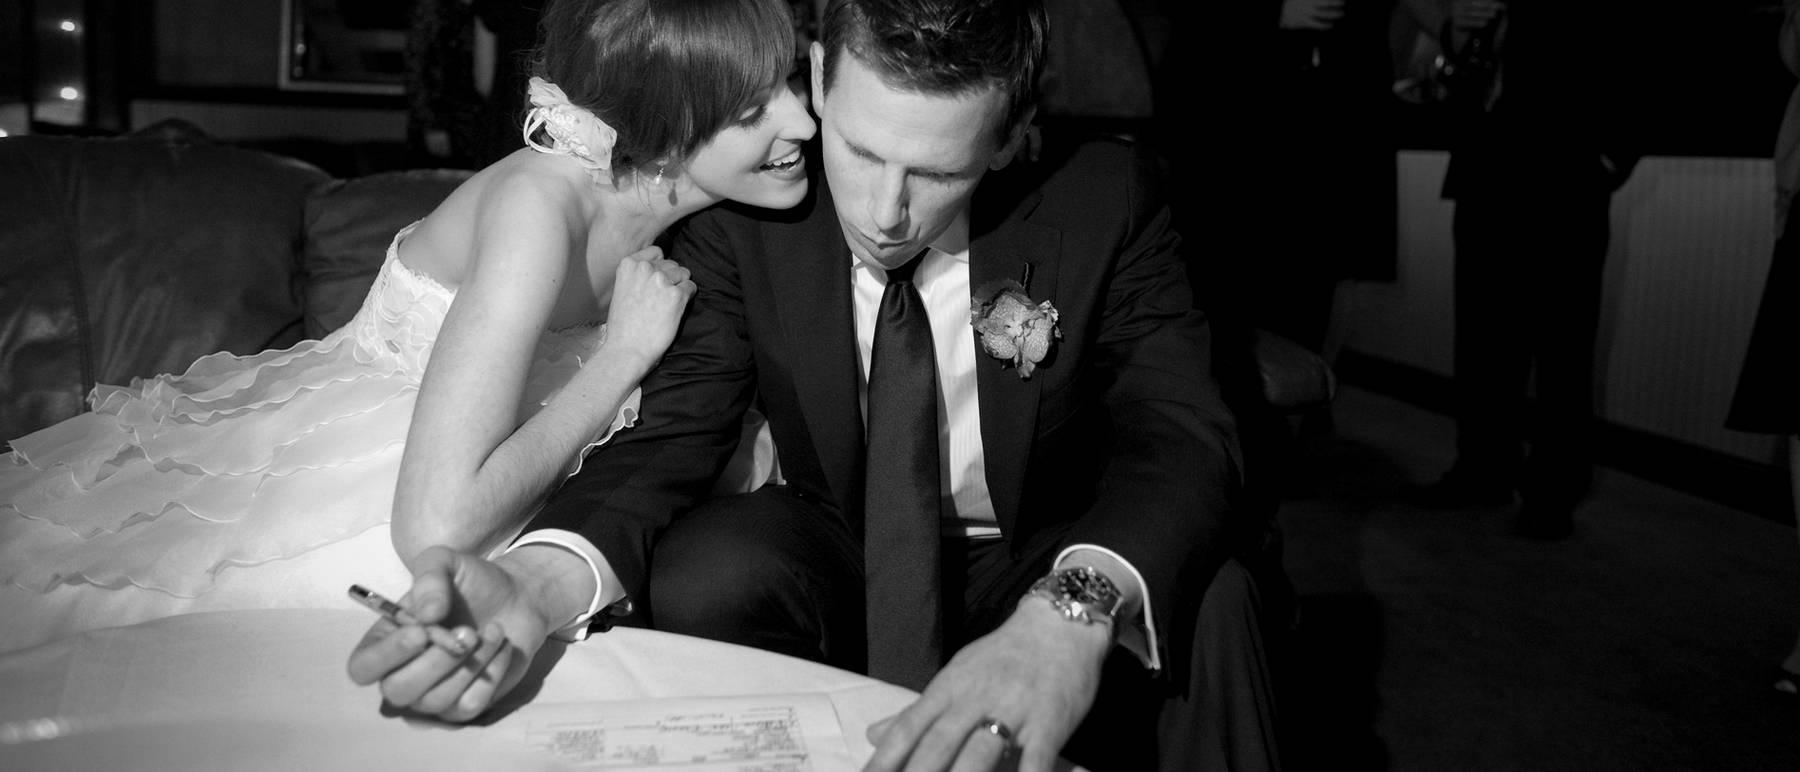 johnandjoseph-wedding-photographer-hz-slider-296